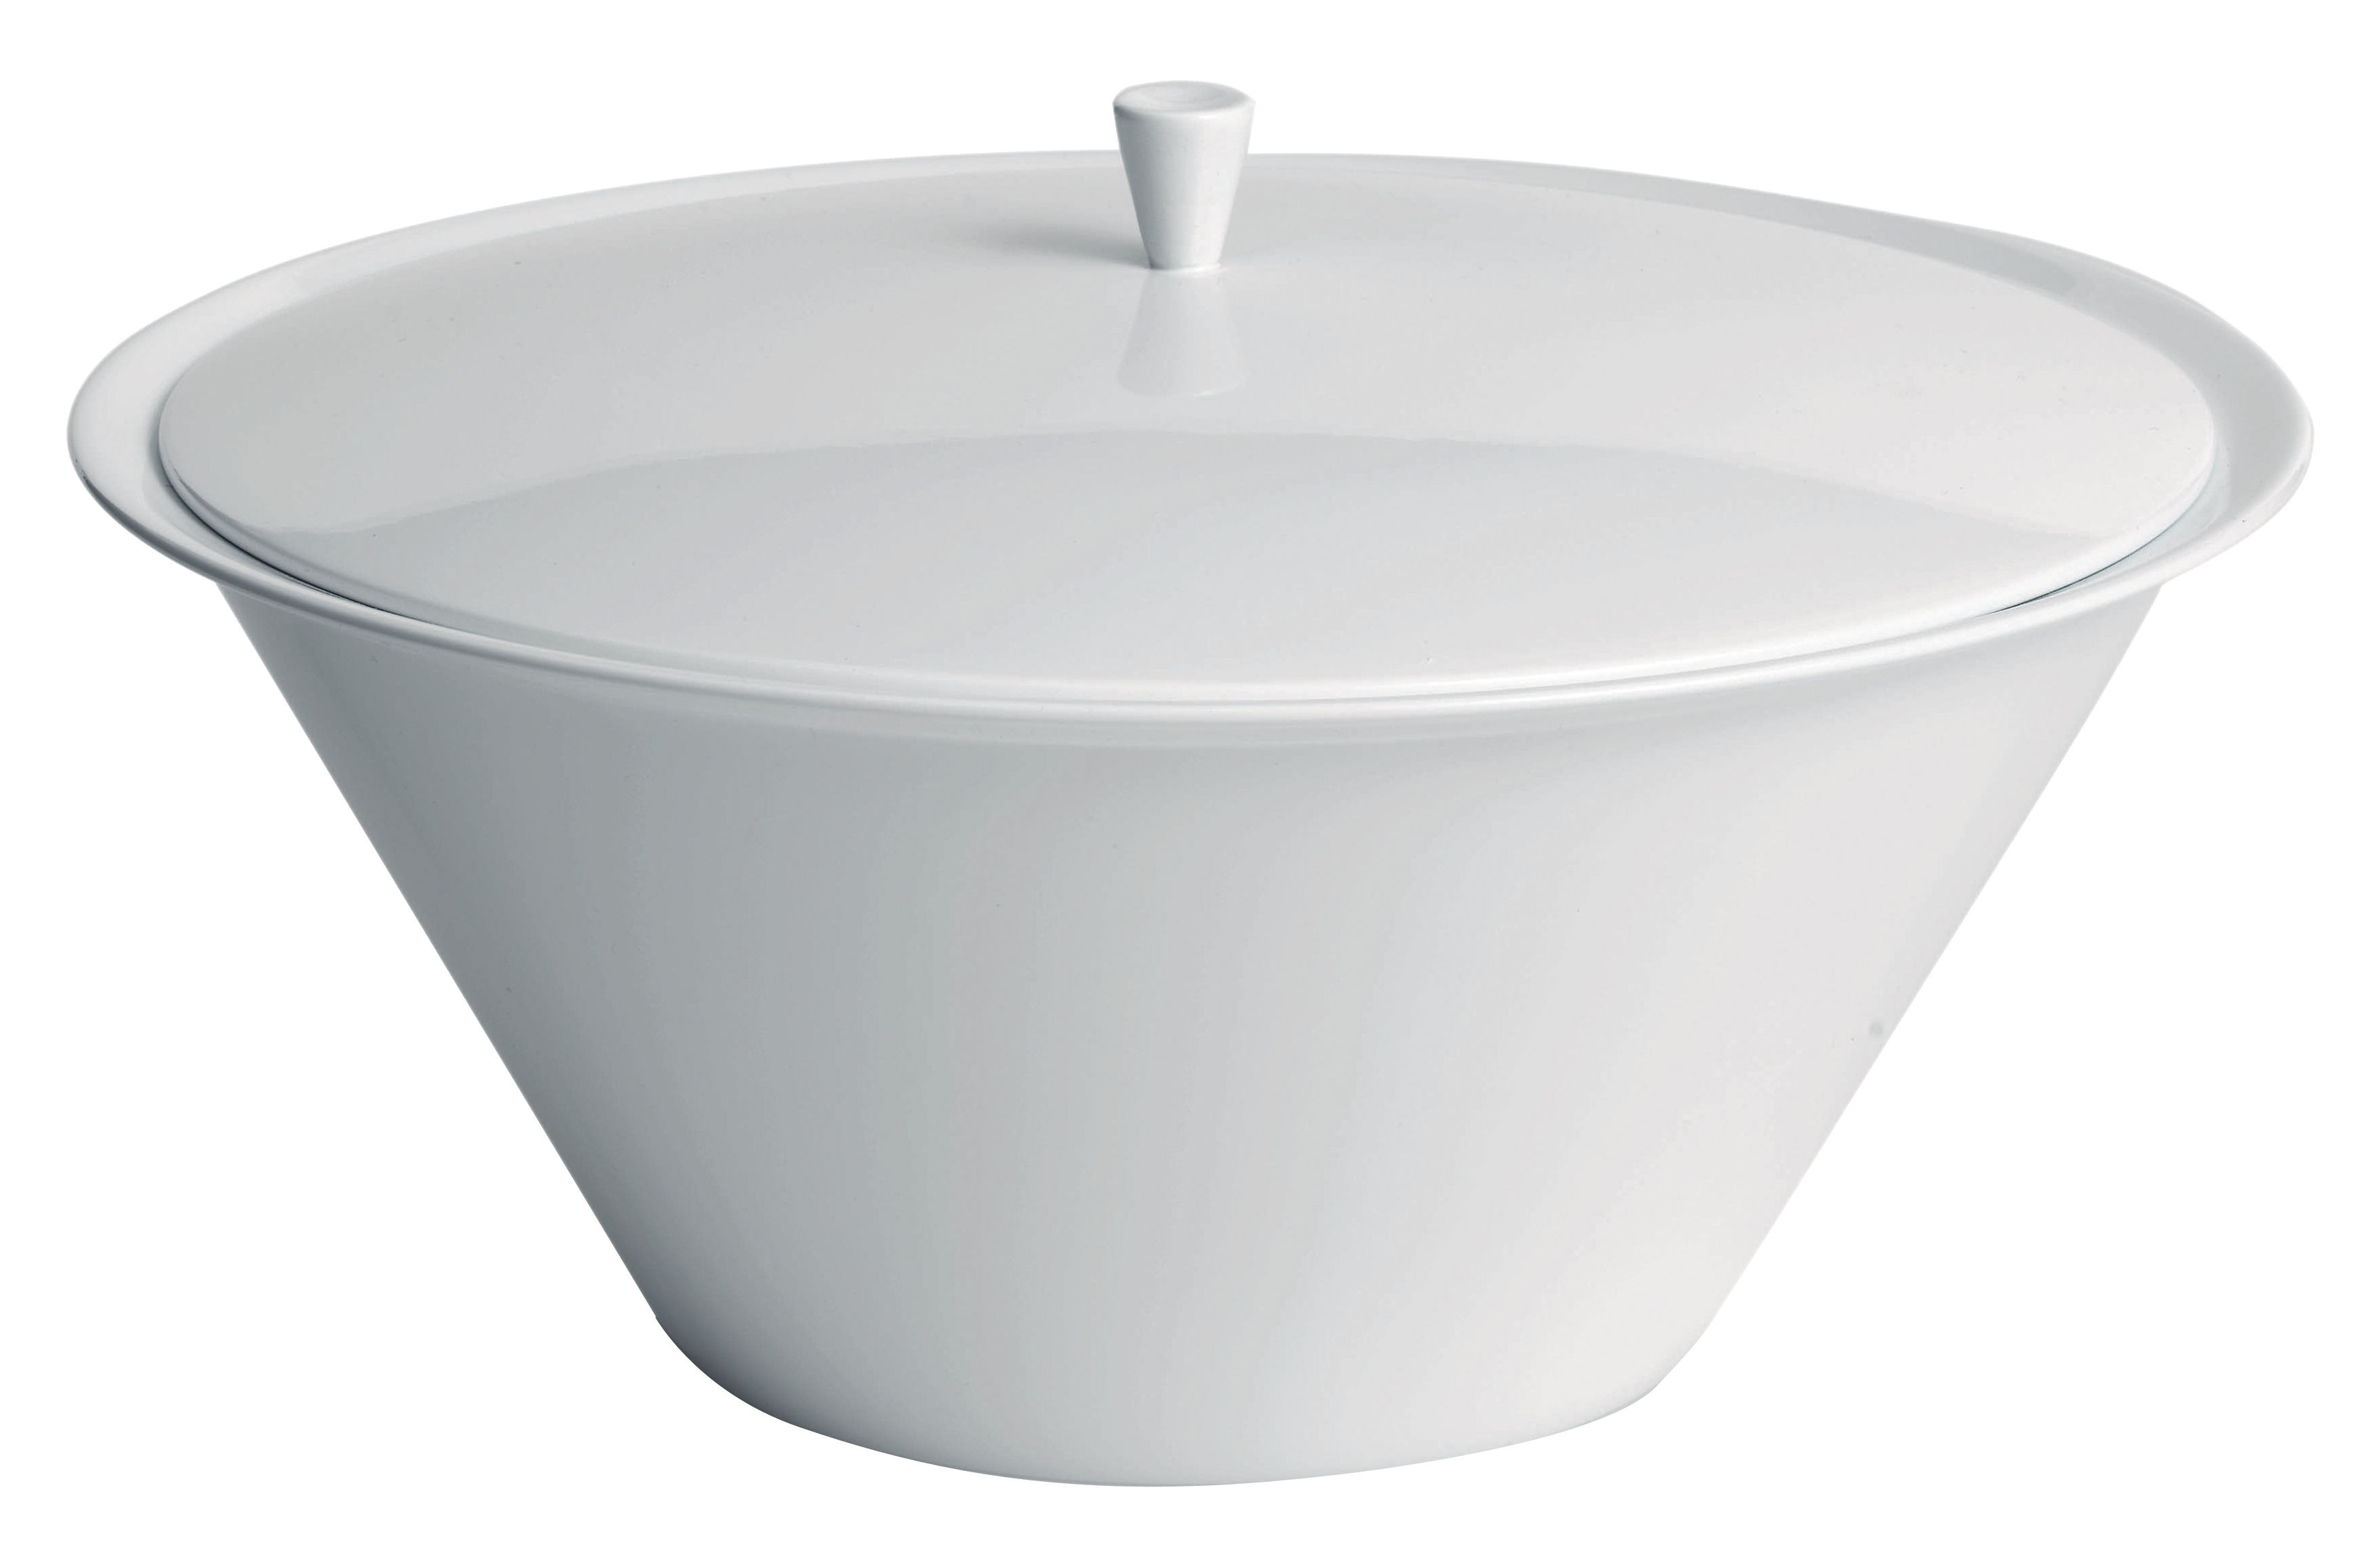 Cuisine - Sucriers, crémiers - Sucrier Anatolia - Driade Kosmo - Blanc - Porcelaine